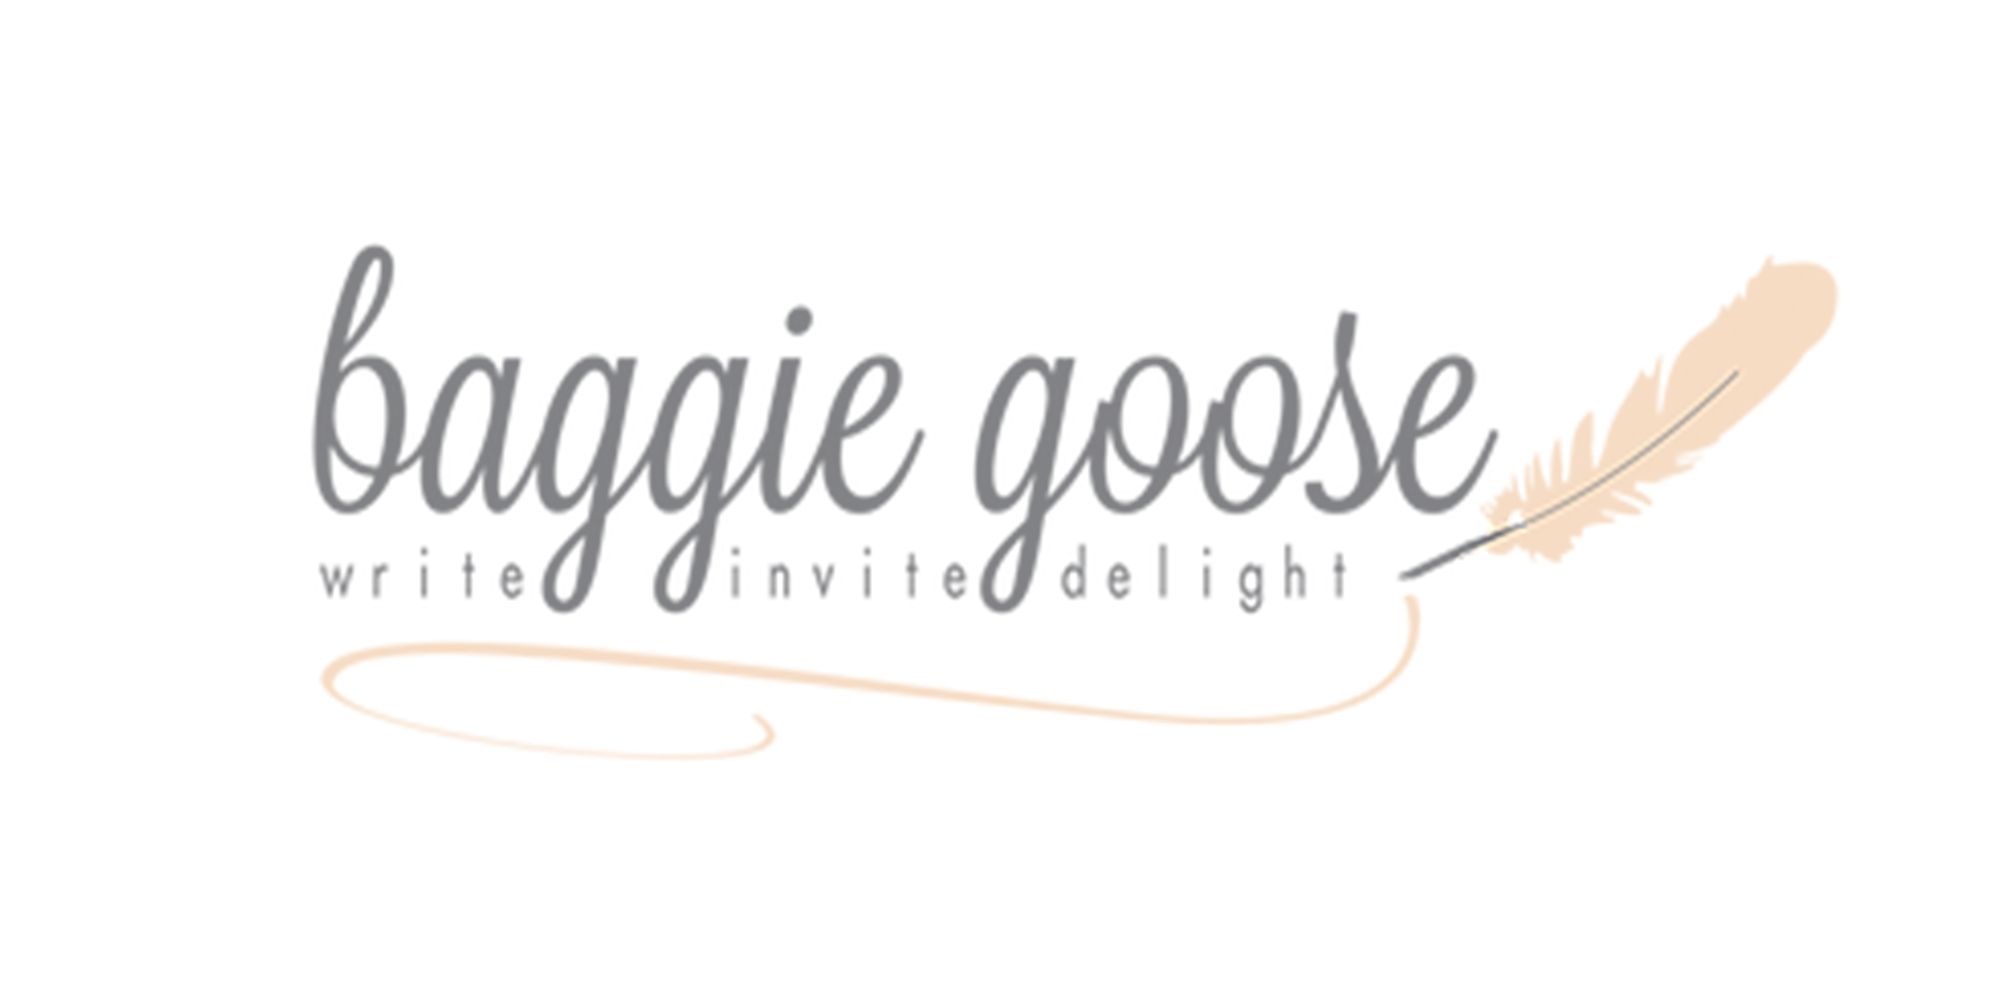 BaggieGooseLogo.png